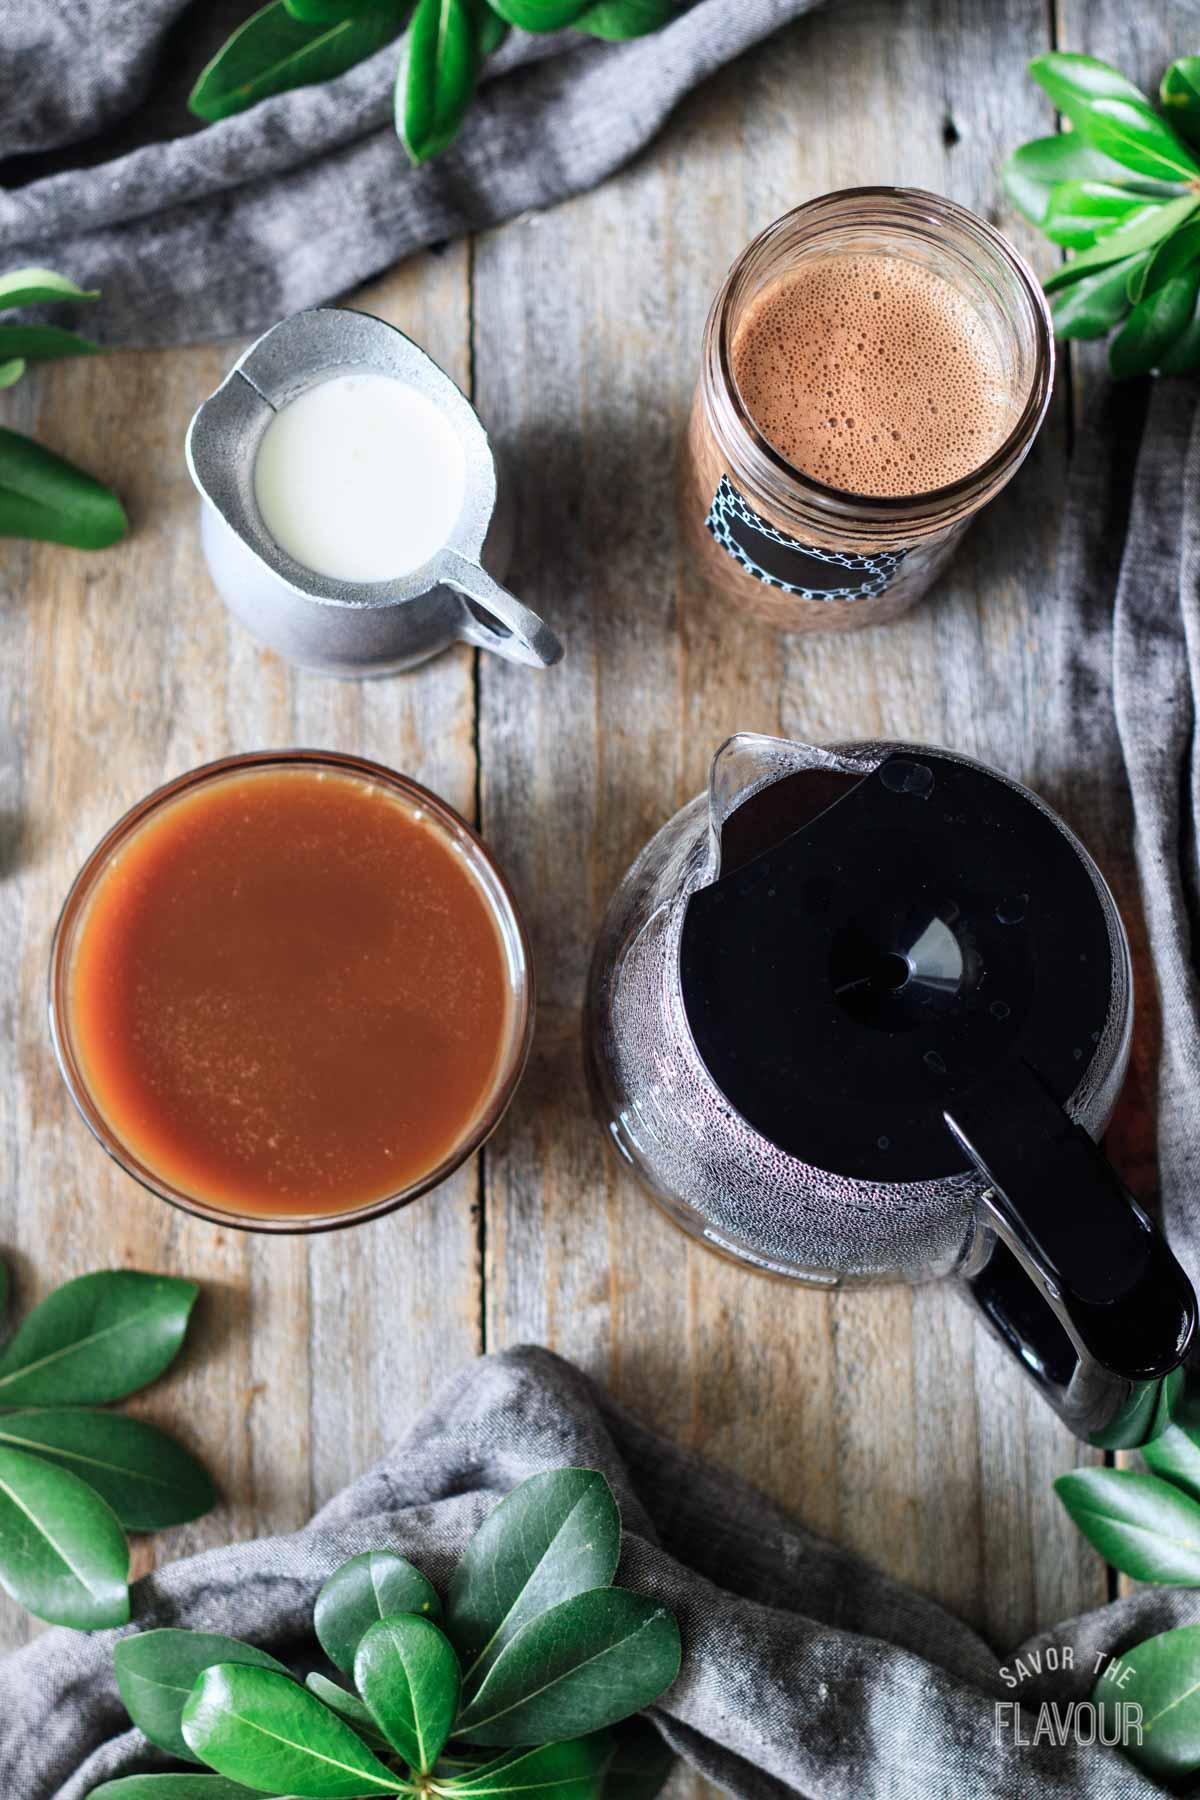 coffee, caramel sauce, chocolate milk, and heavy cream